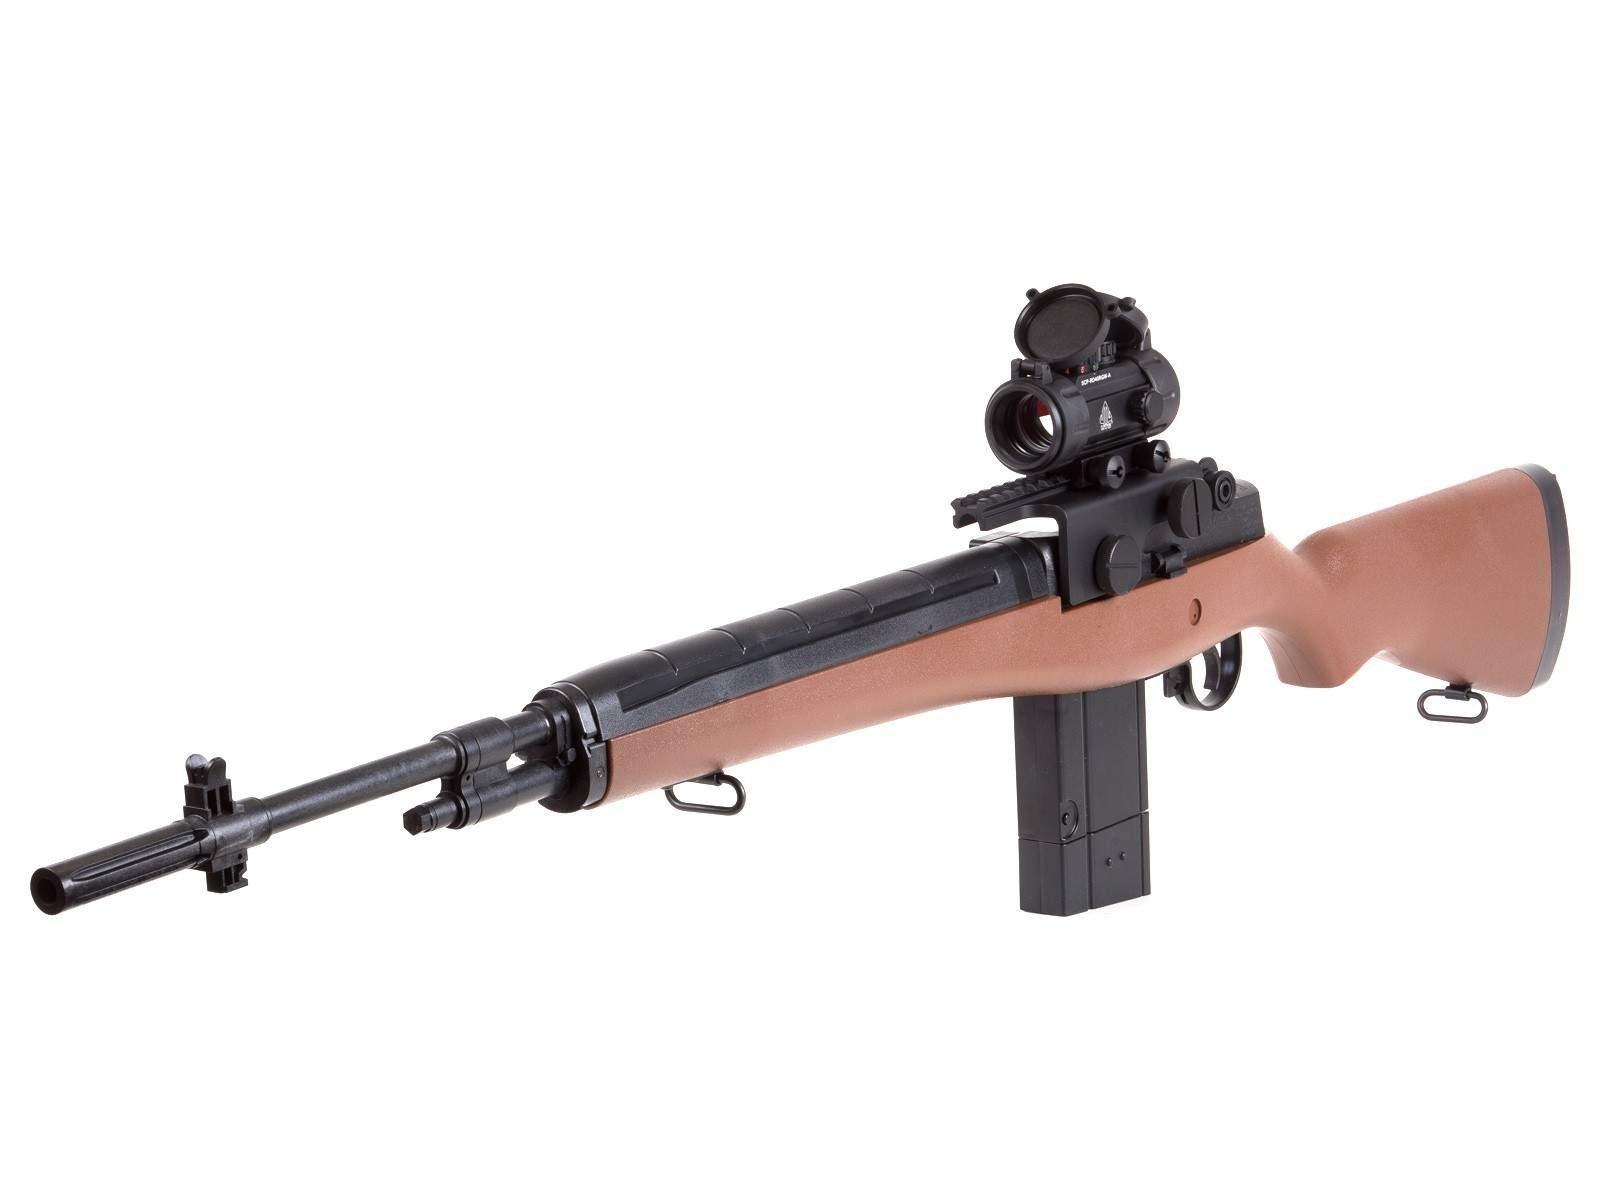 daisy bb guns pellet guns an winchester m14 co2 air rifle kit